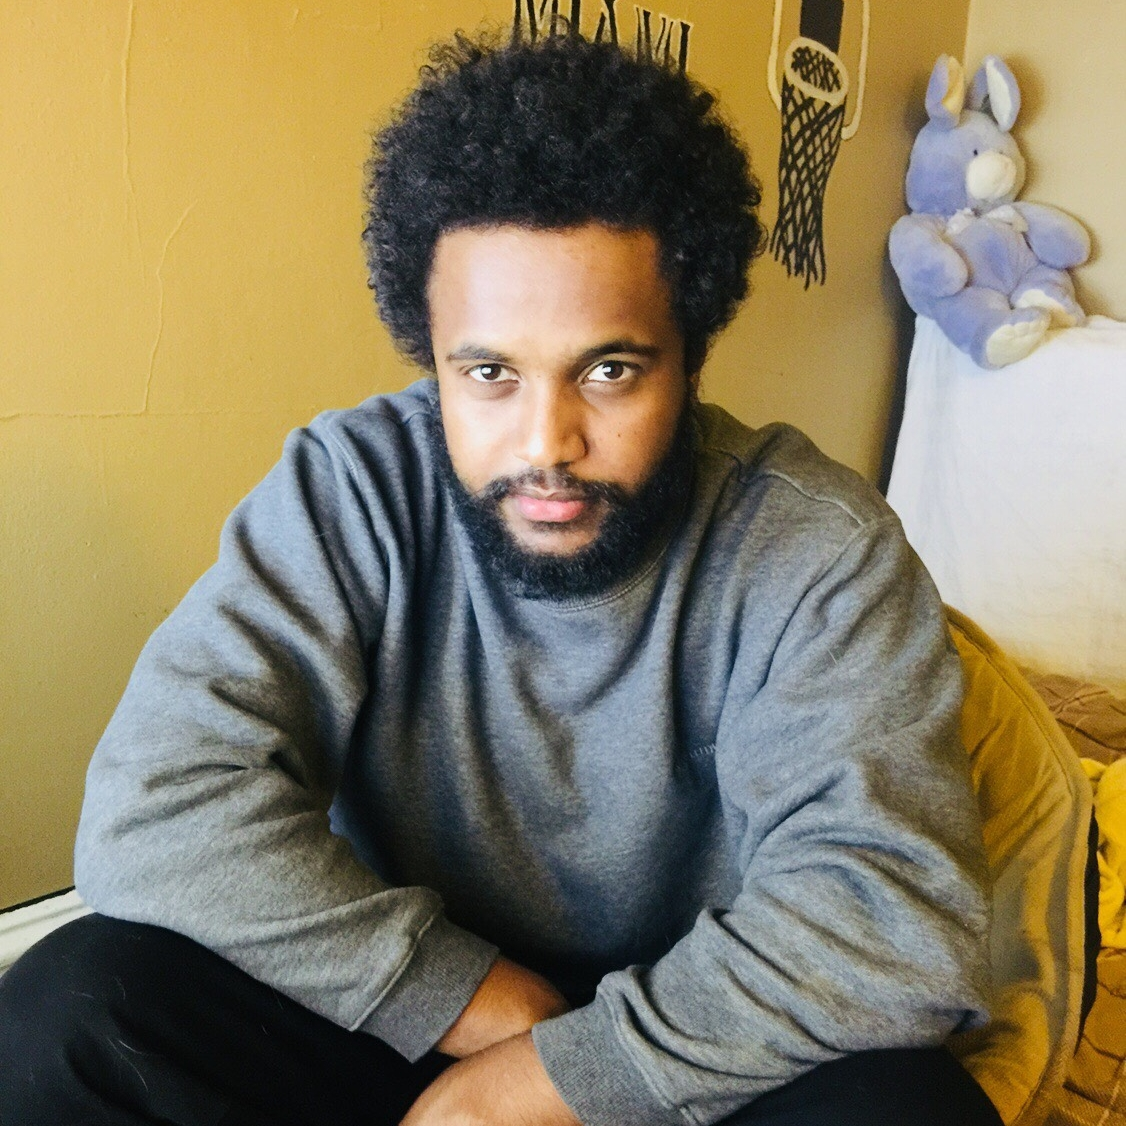 Mesfin Muleta - He/Him/His, Bemidji State University